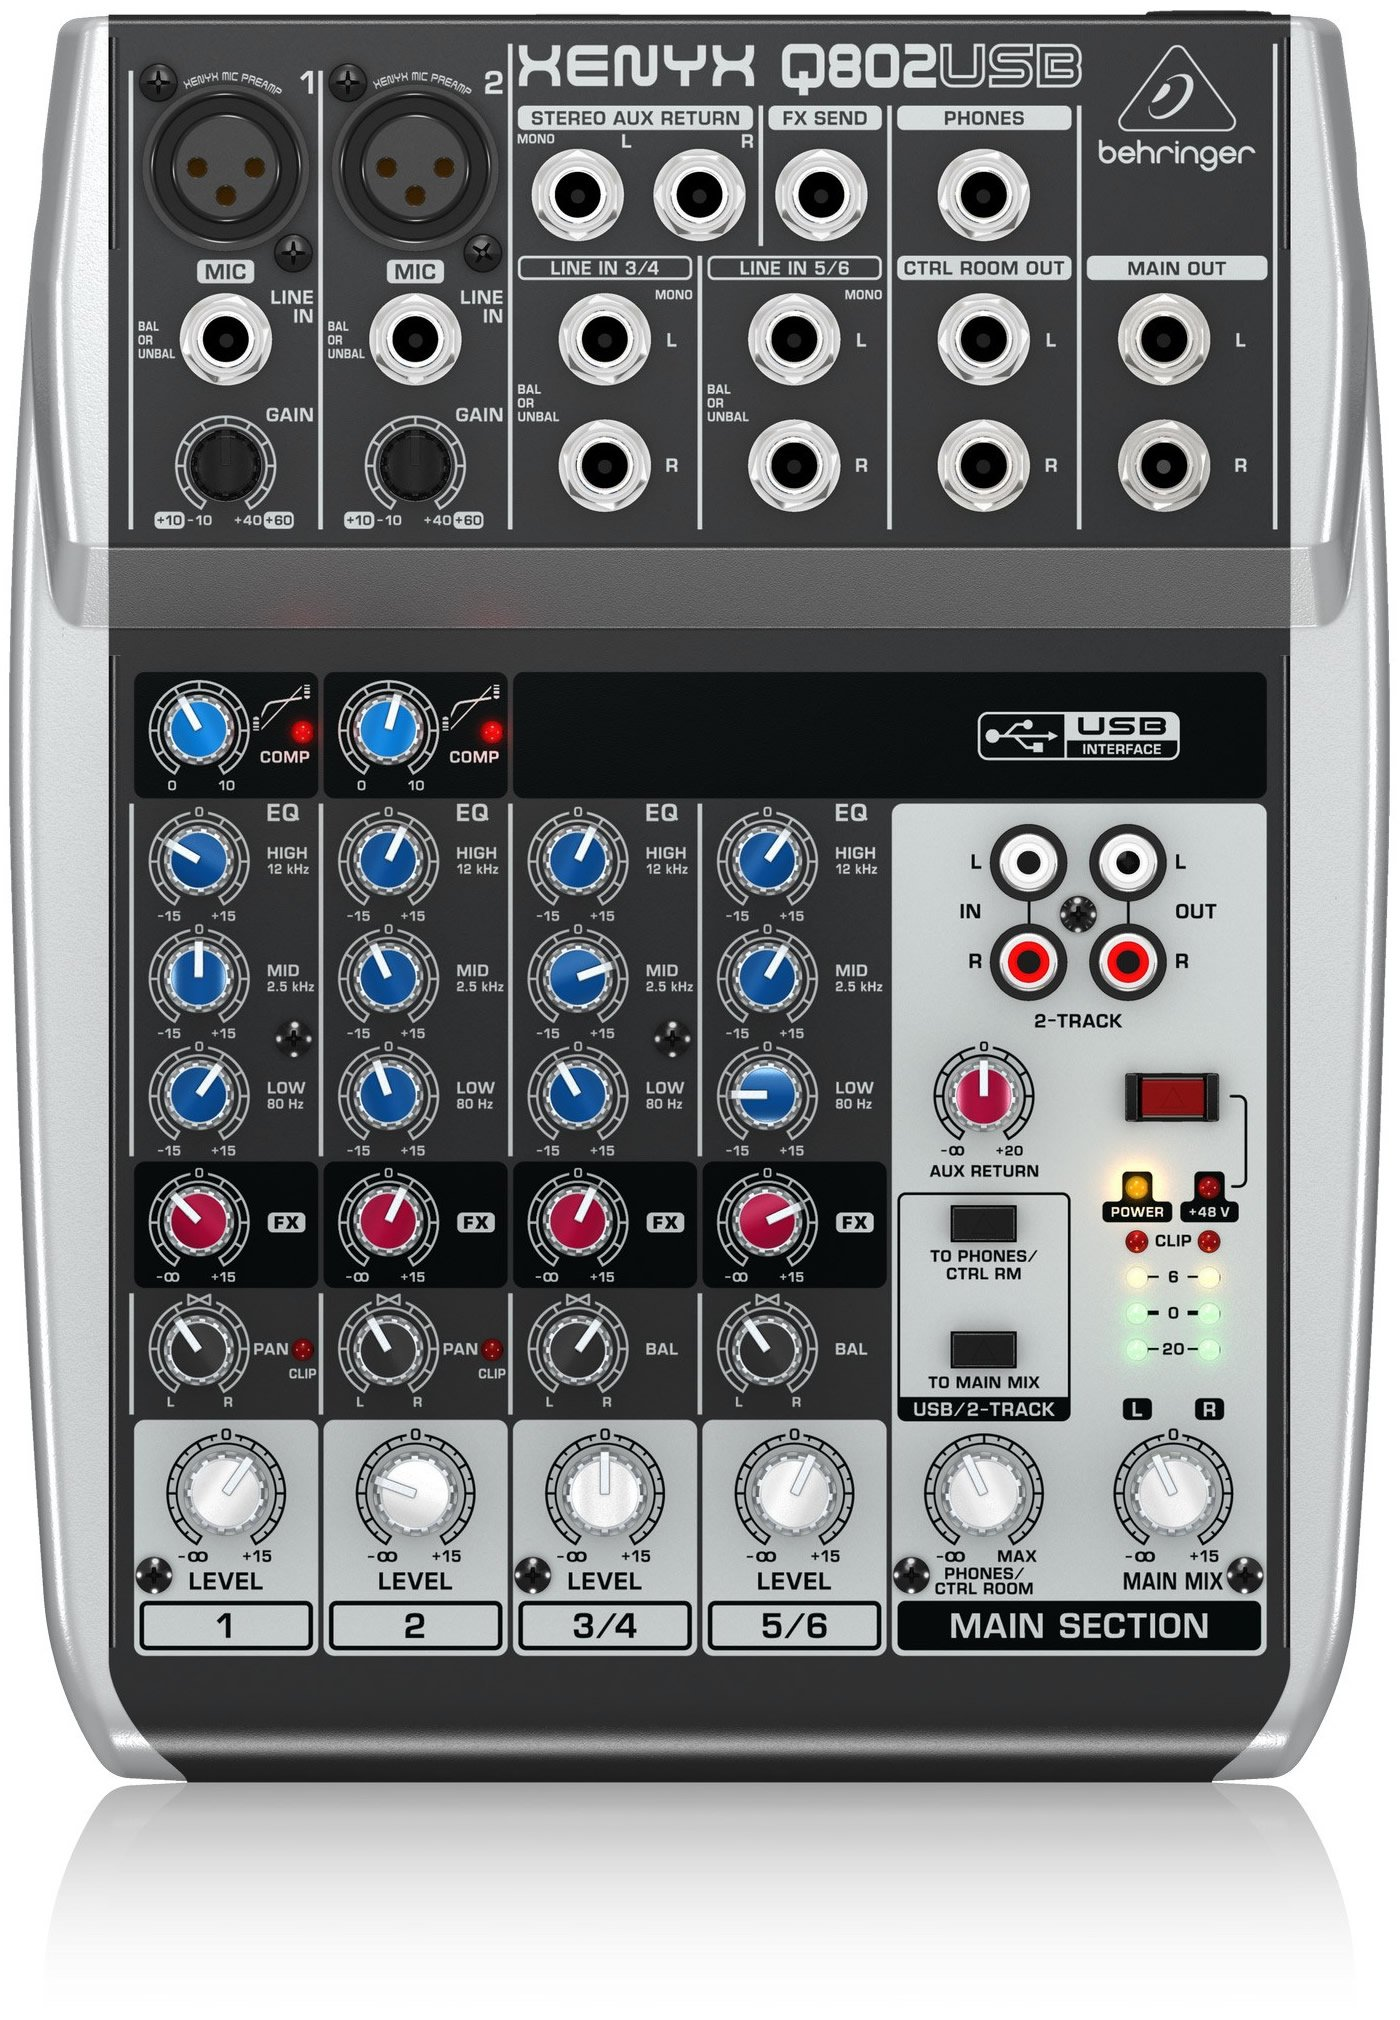 Behringer Q802USB | 8 Input 2 Bus Mixer by Behringer